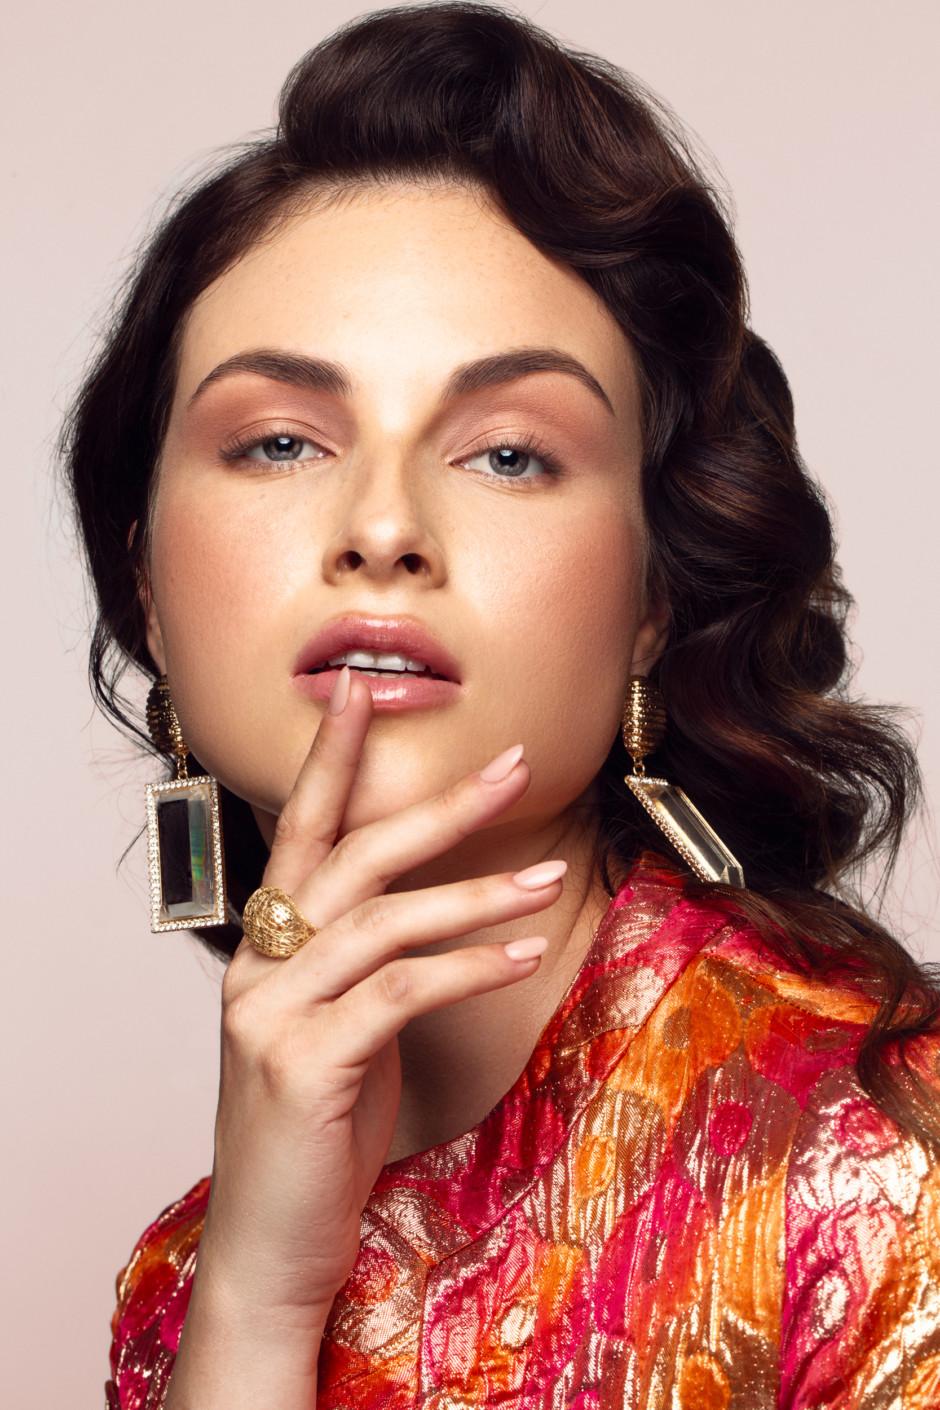 Nicole Beauty Fashion Low Res-5